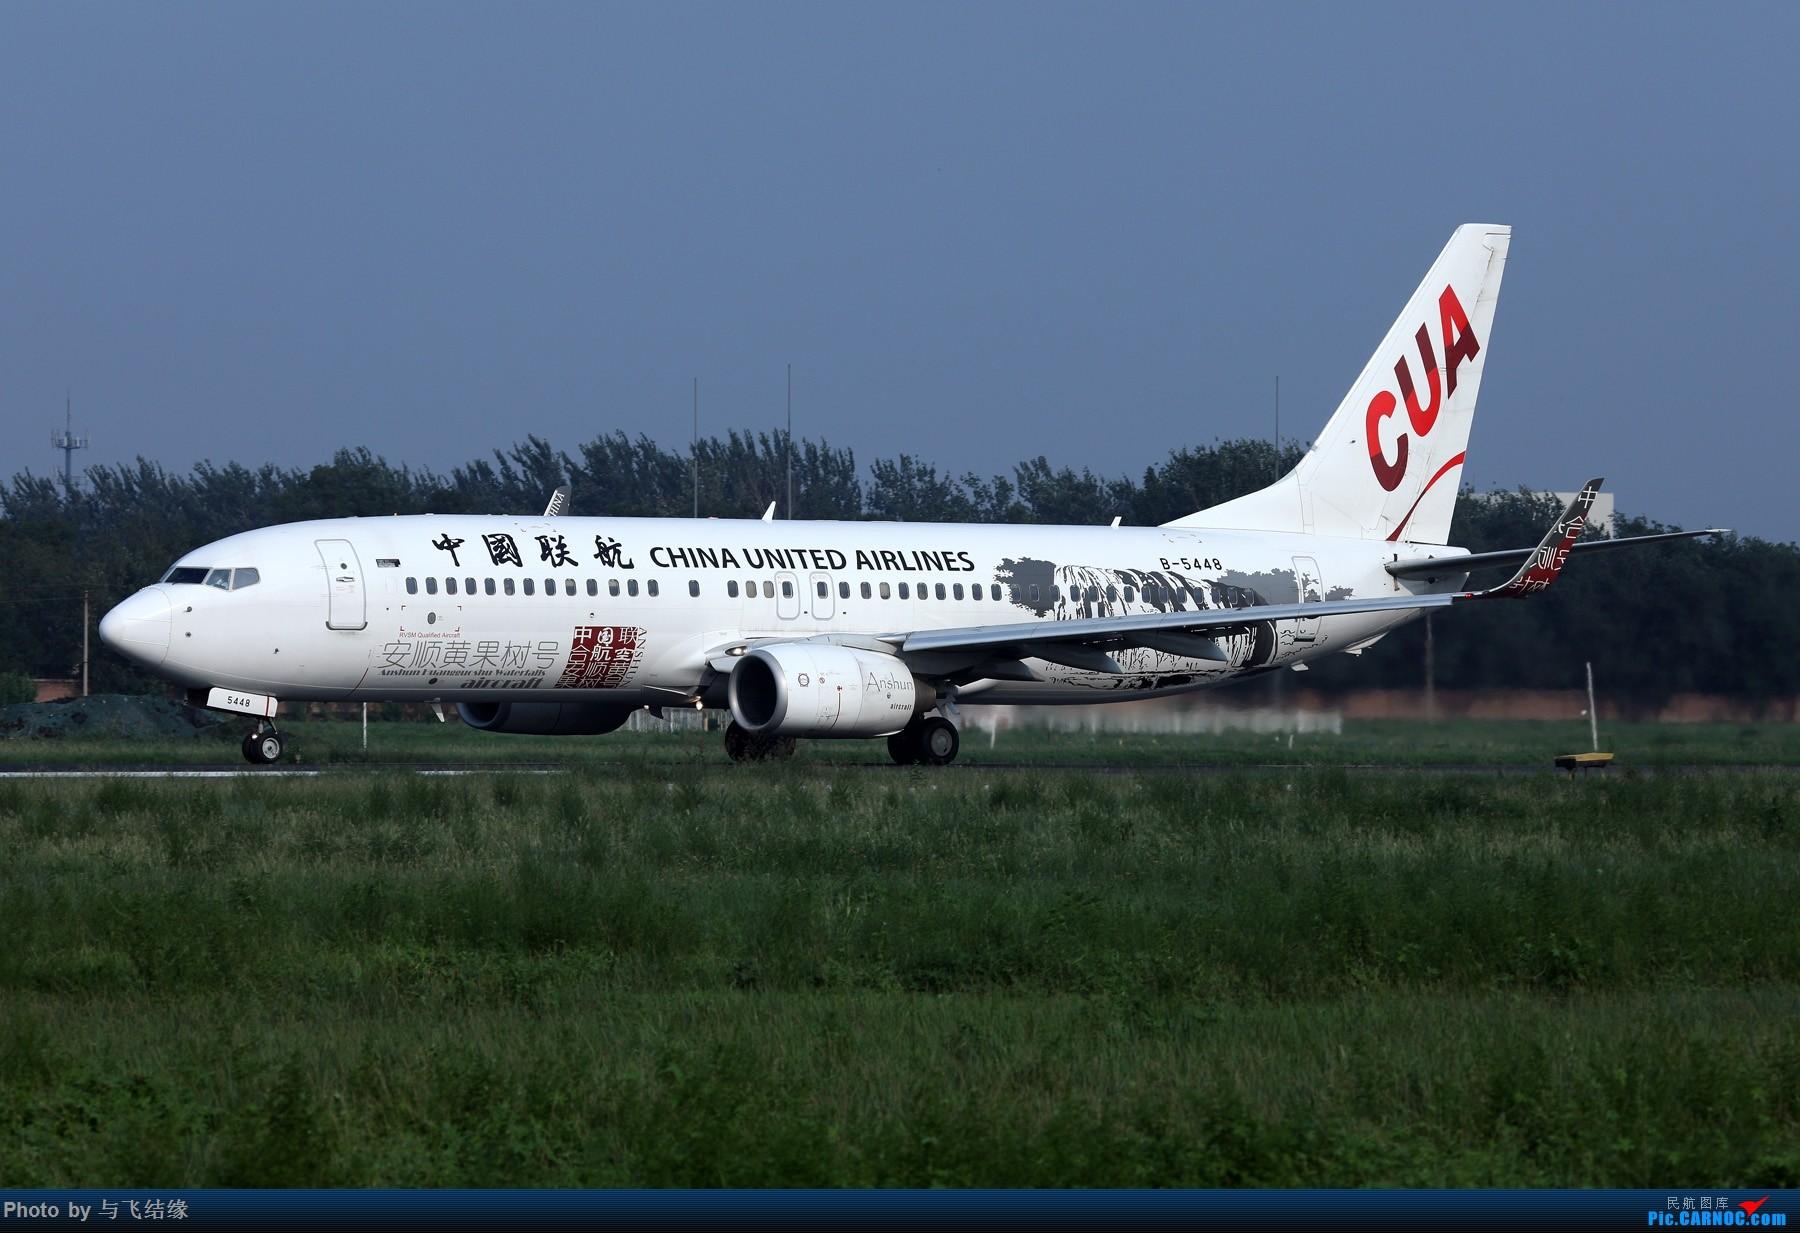 Re:[原创]要问彩绘哪家强,中国北京找联航。 BOEING 737-800 B-5448 中国北京南苑机场